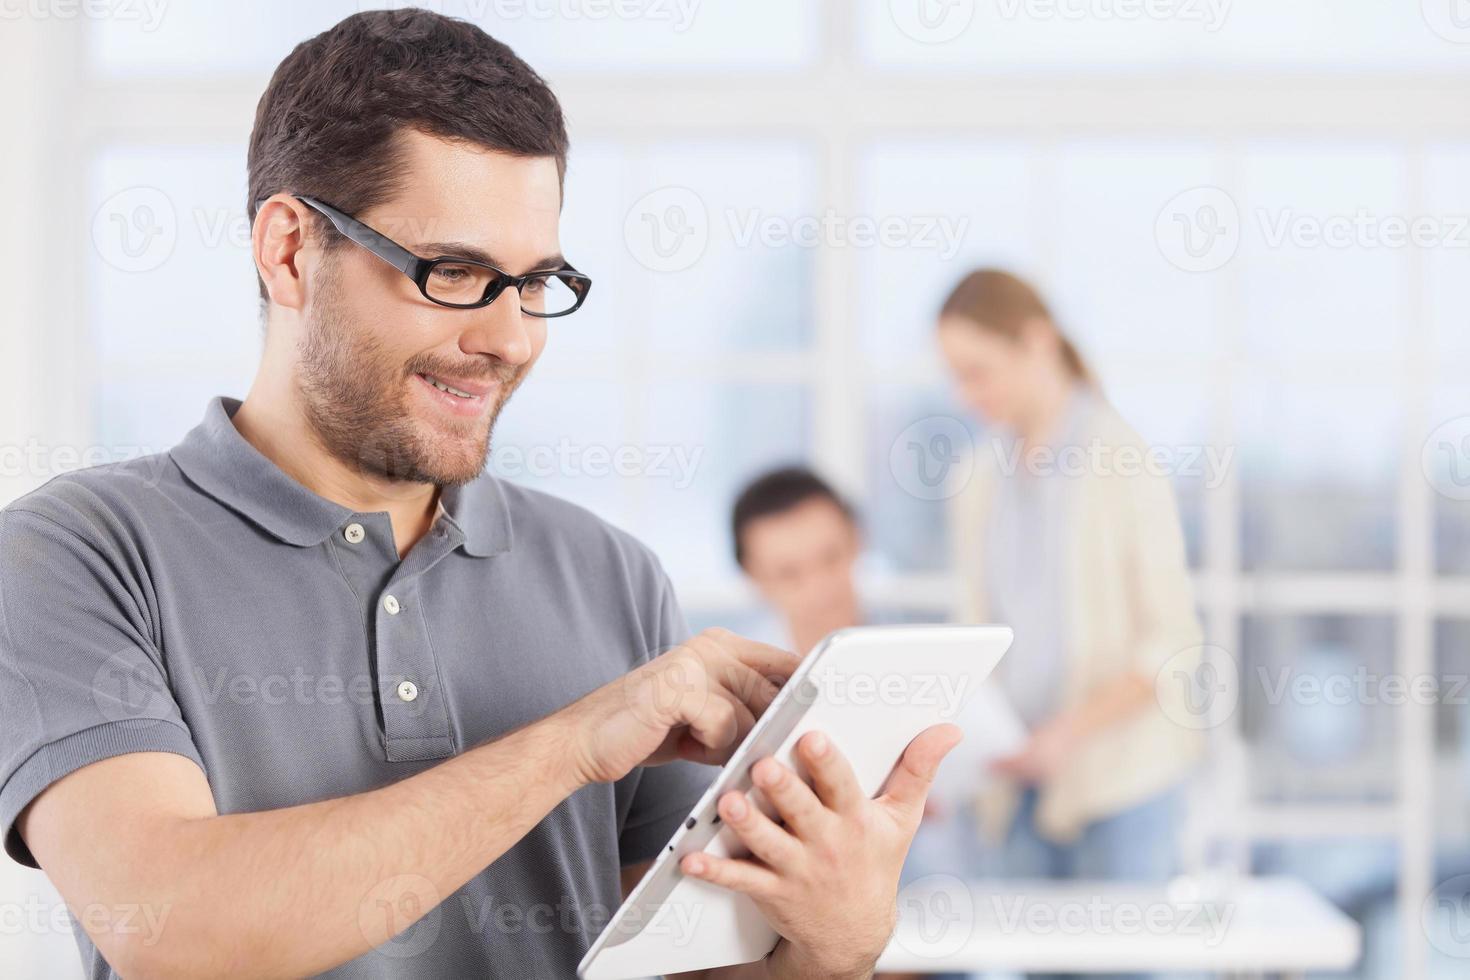 Mann mit digitaler Tablette. foto